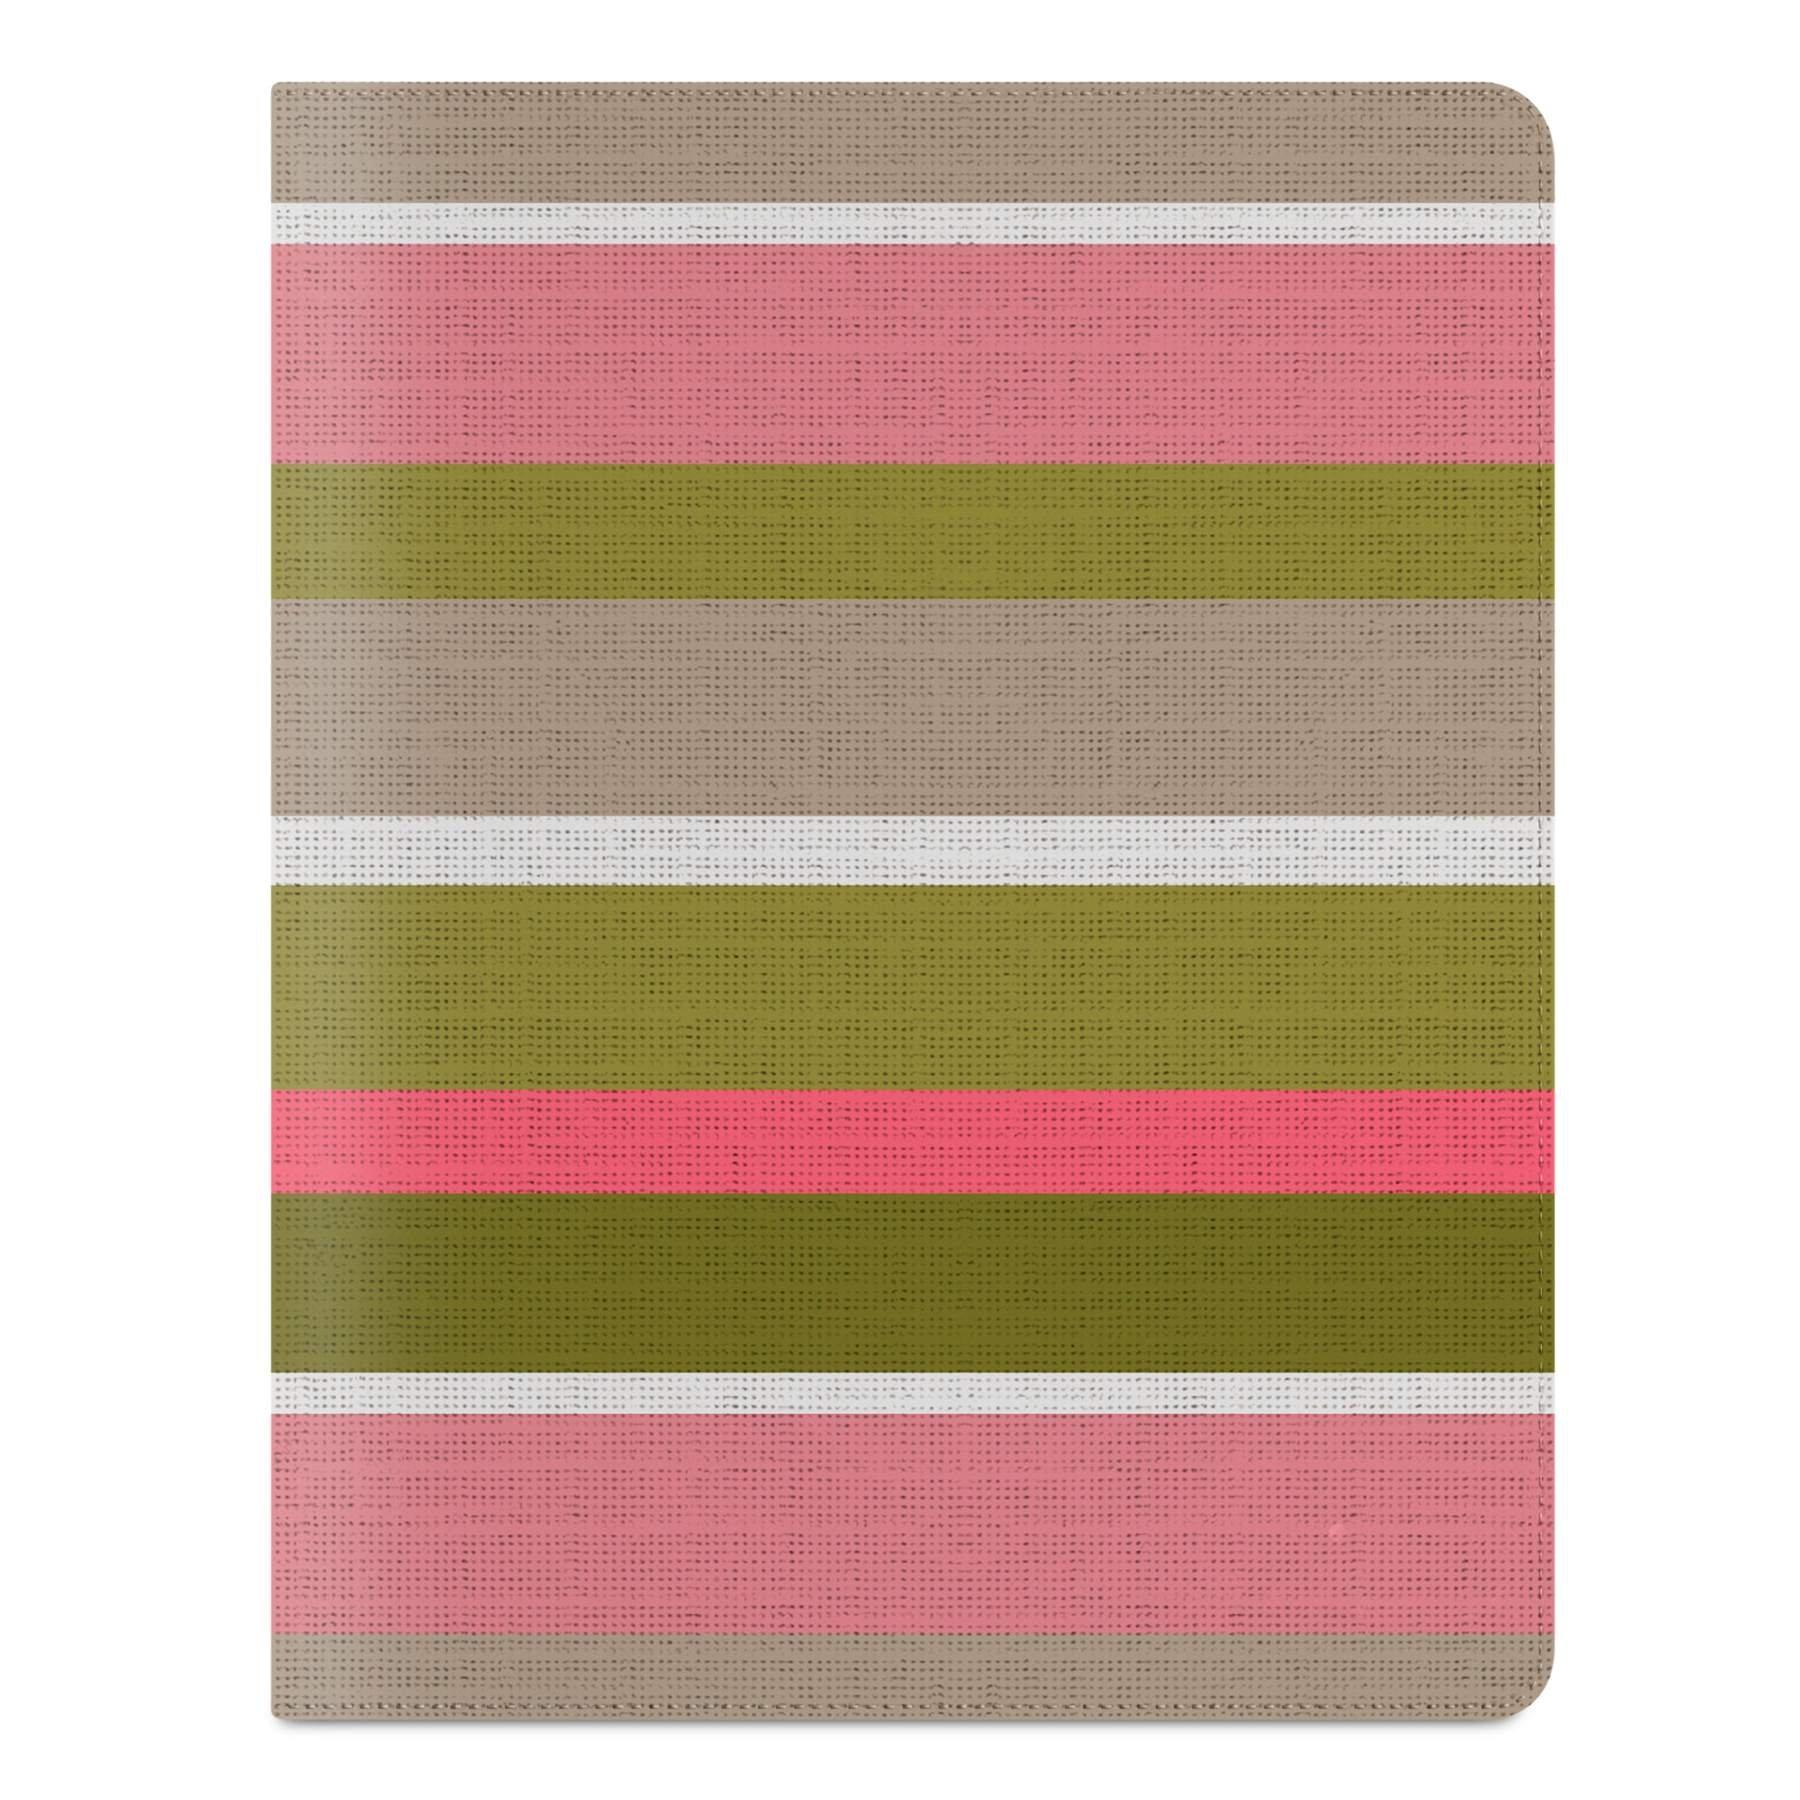 Belkin FormFit Cover / Case for iPad Air (iPad 5) (Fuchsia)